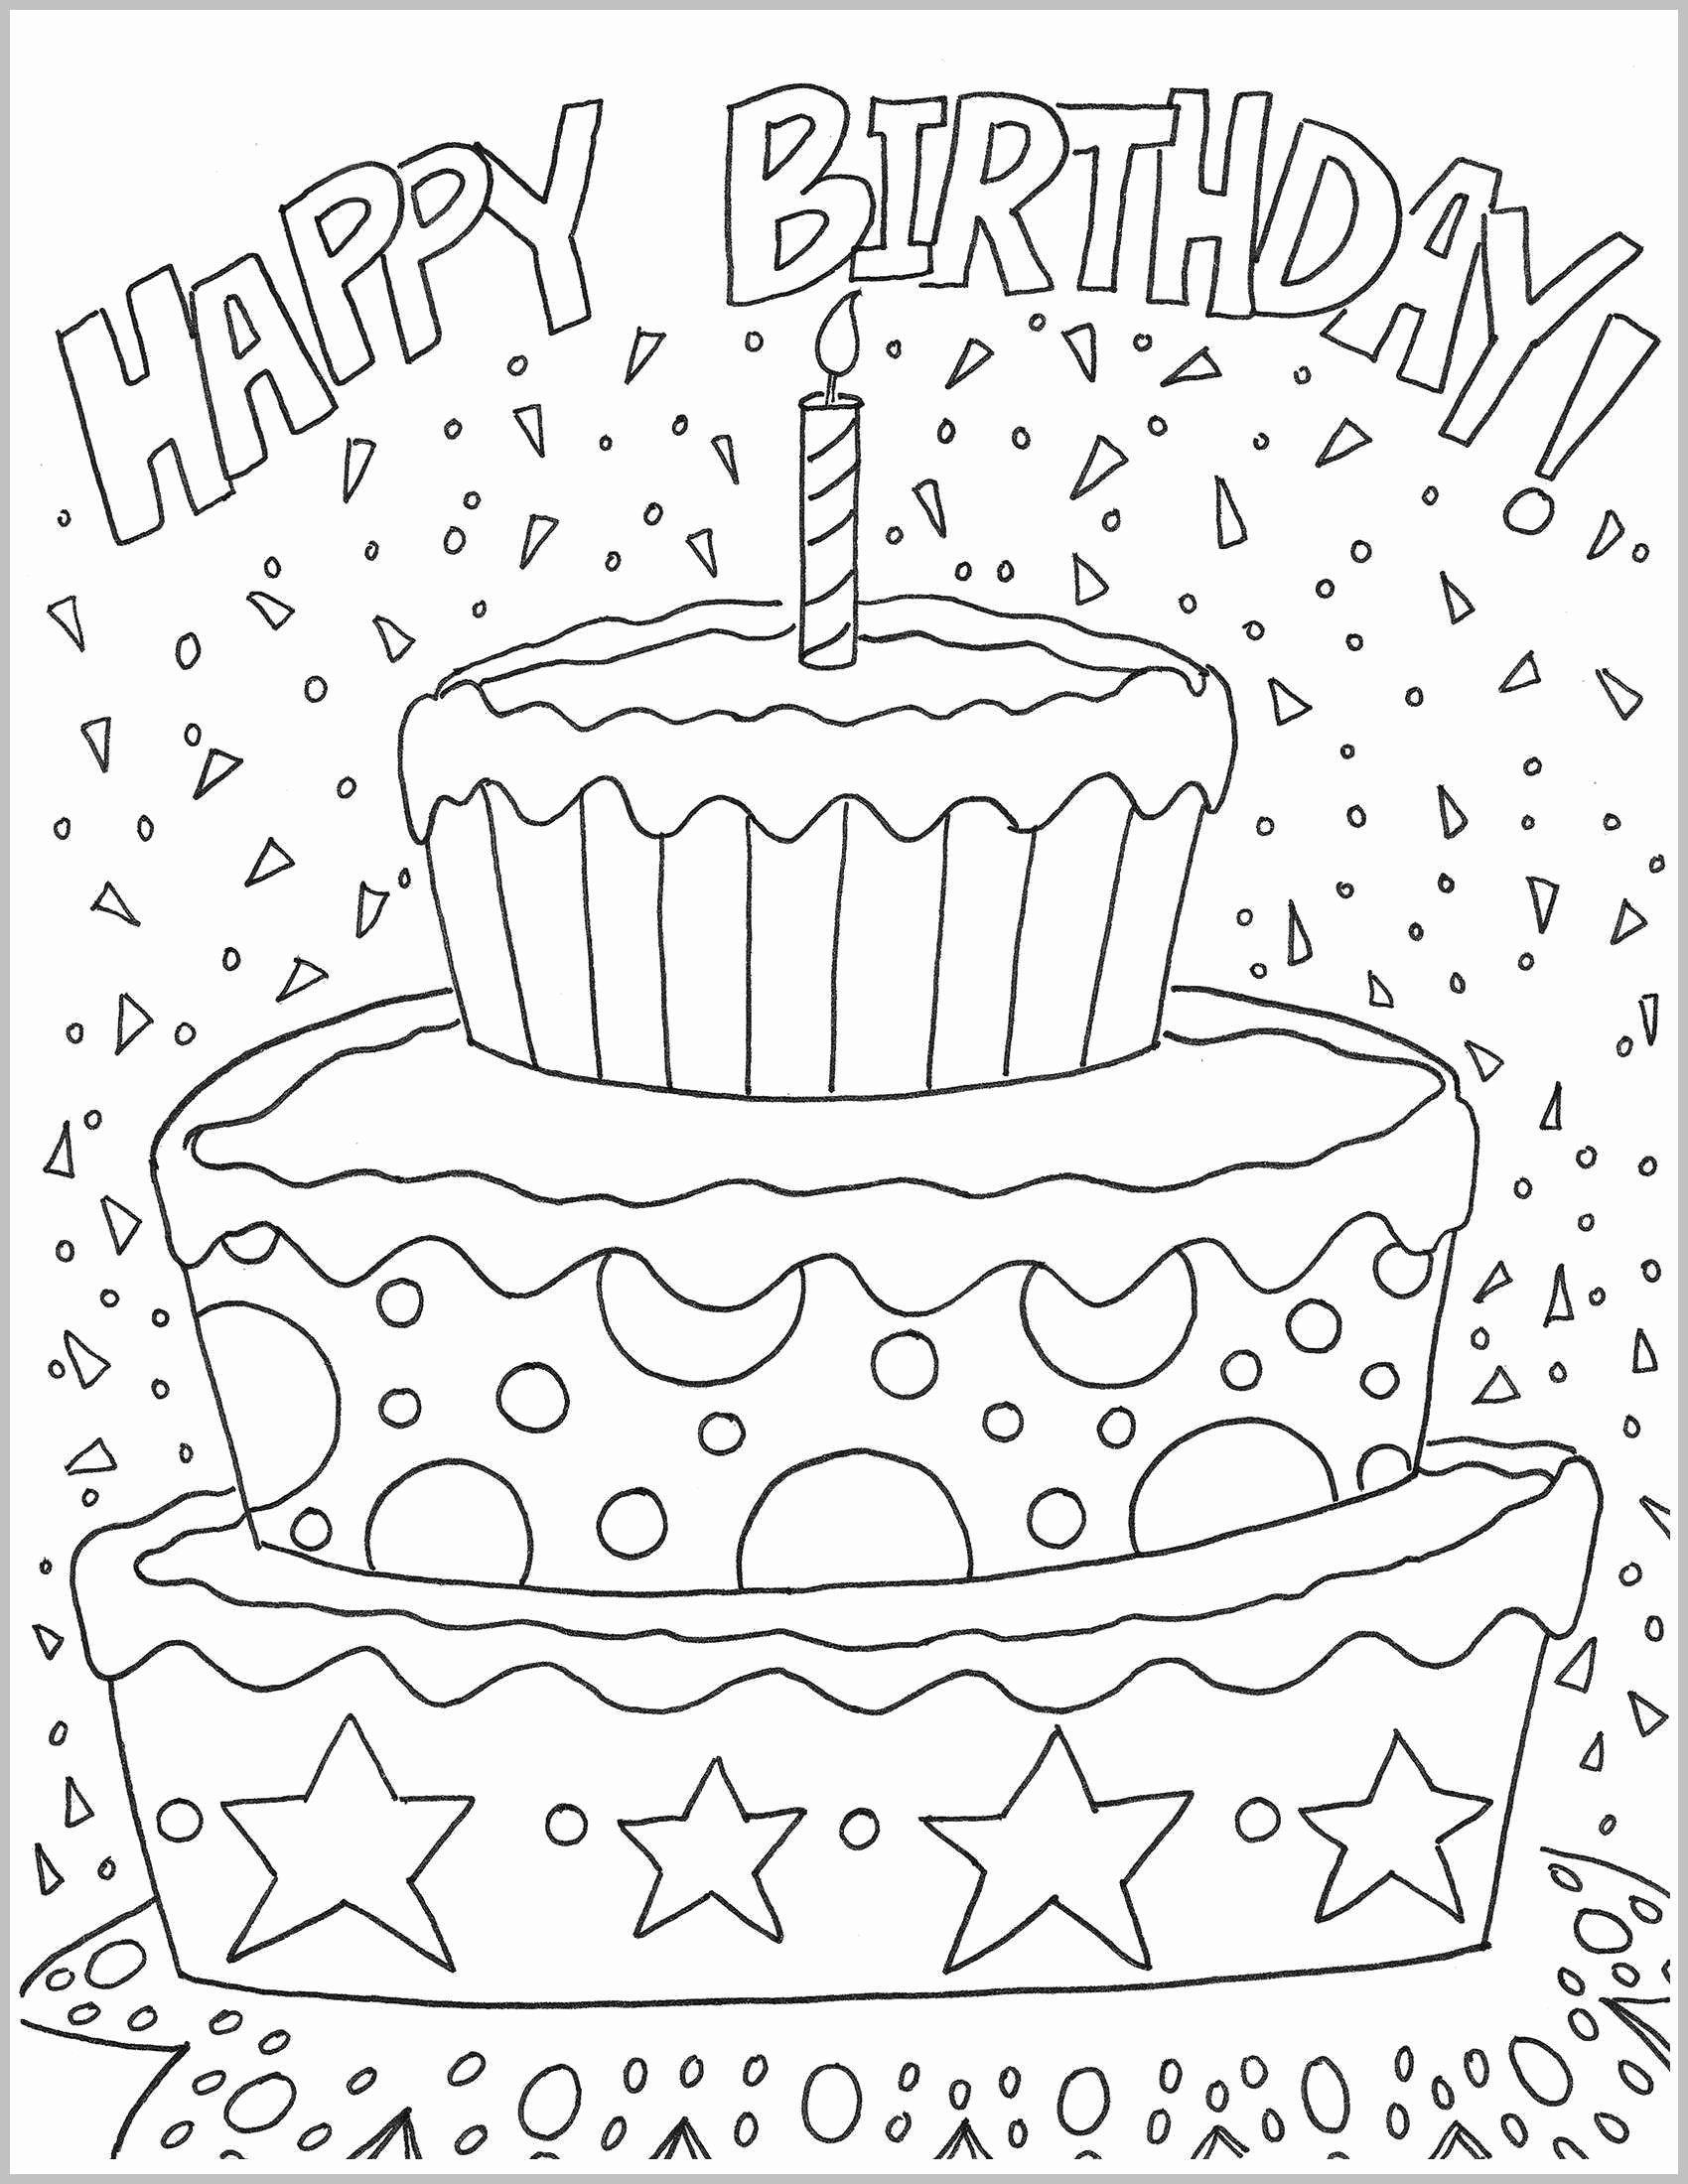 Happy 3rd Birthday Grandson Luxury Happy Birthday Cake Coloring Sheet Elegant Bi Coloring Birthday Cards Happy Birthday Coloring Pages Happy Birthday Printable